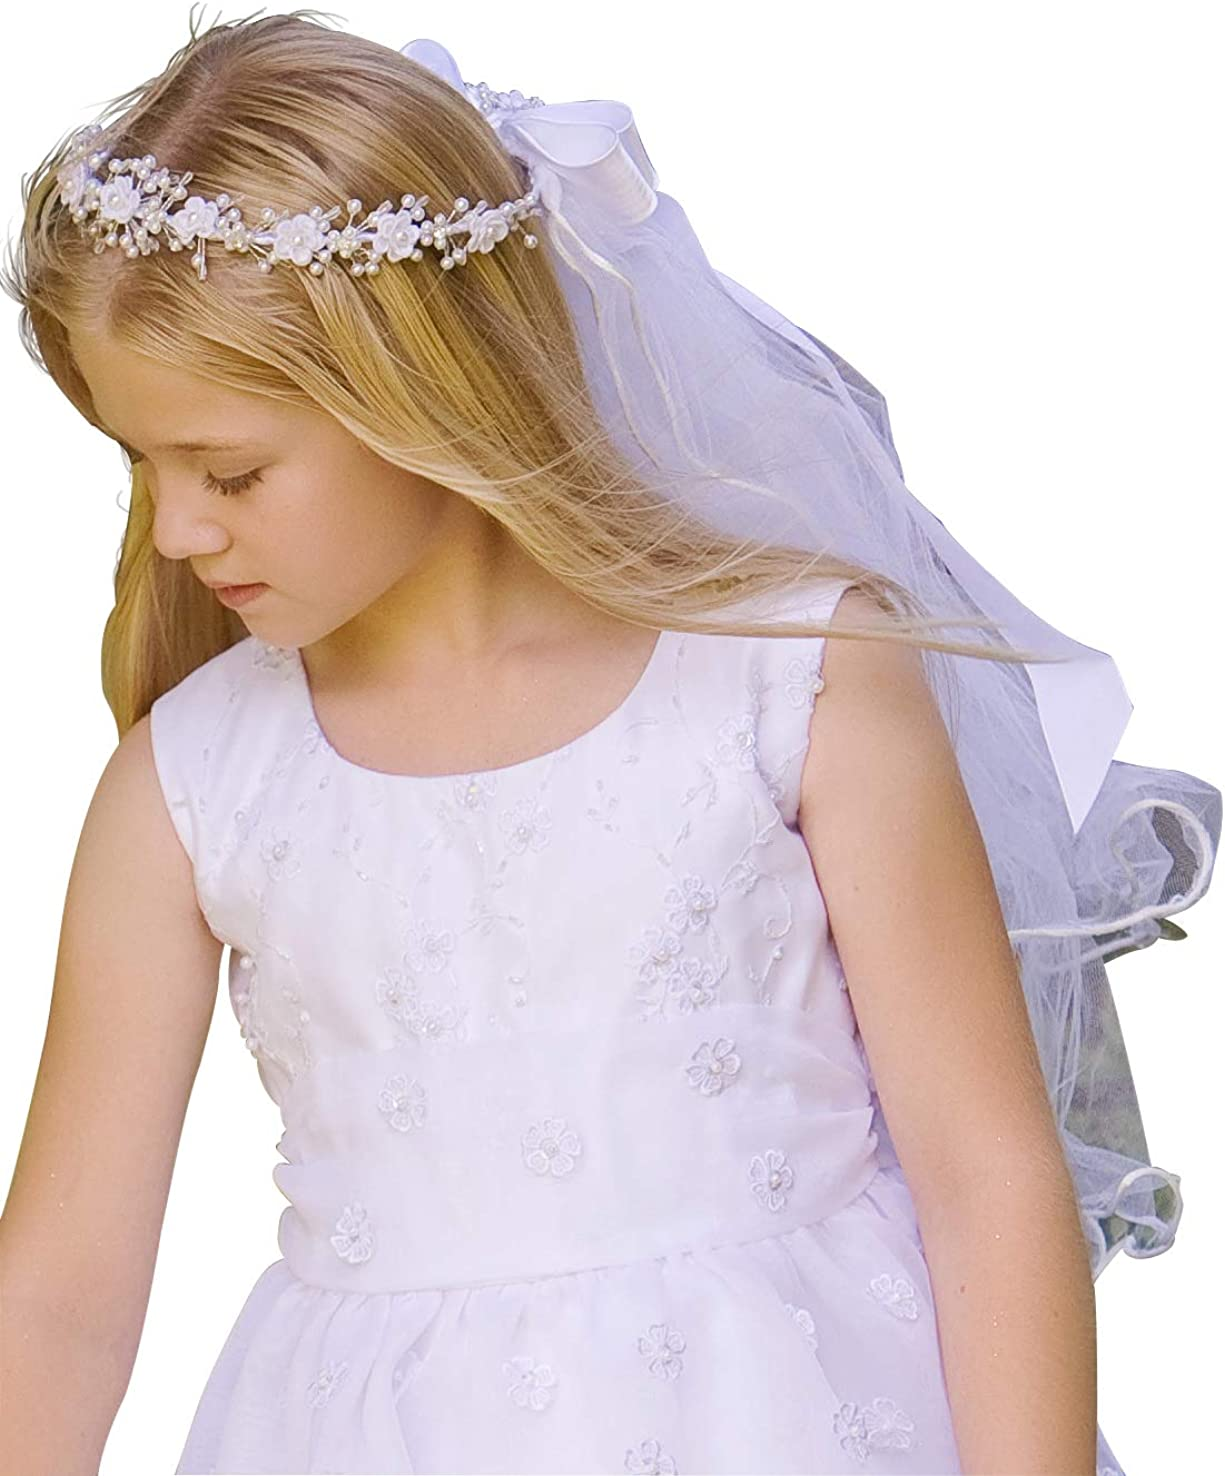 Swea Pea & Lilli Communion Veil for Girls - White First Communion Corded Rosebuds w/Bead Accents & Satin Ribbon